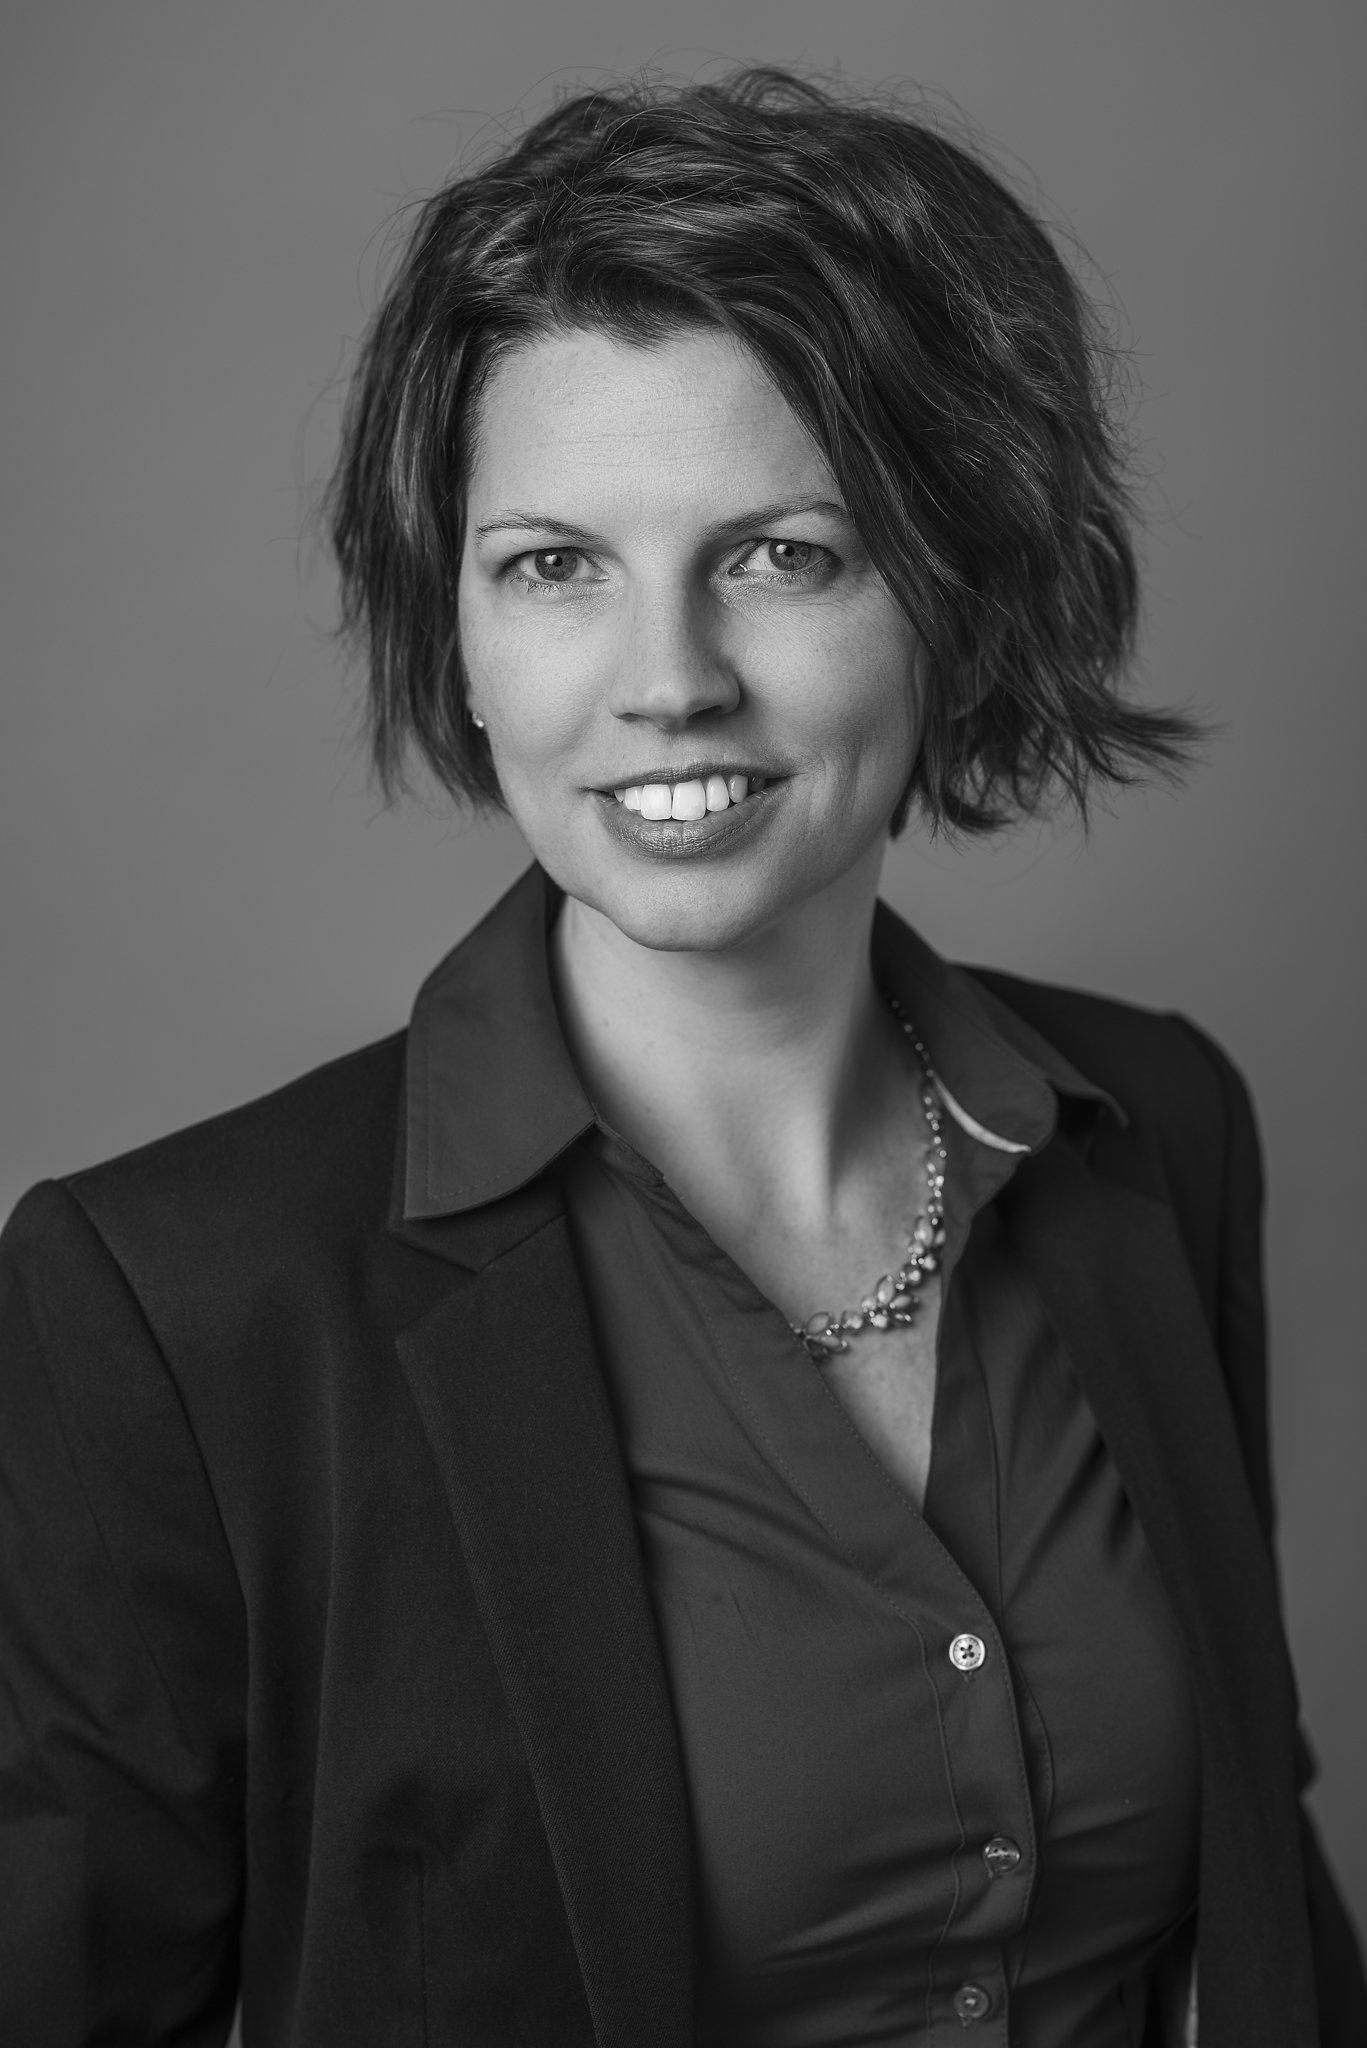 MeganO'Neil-Portrait